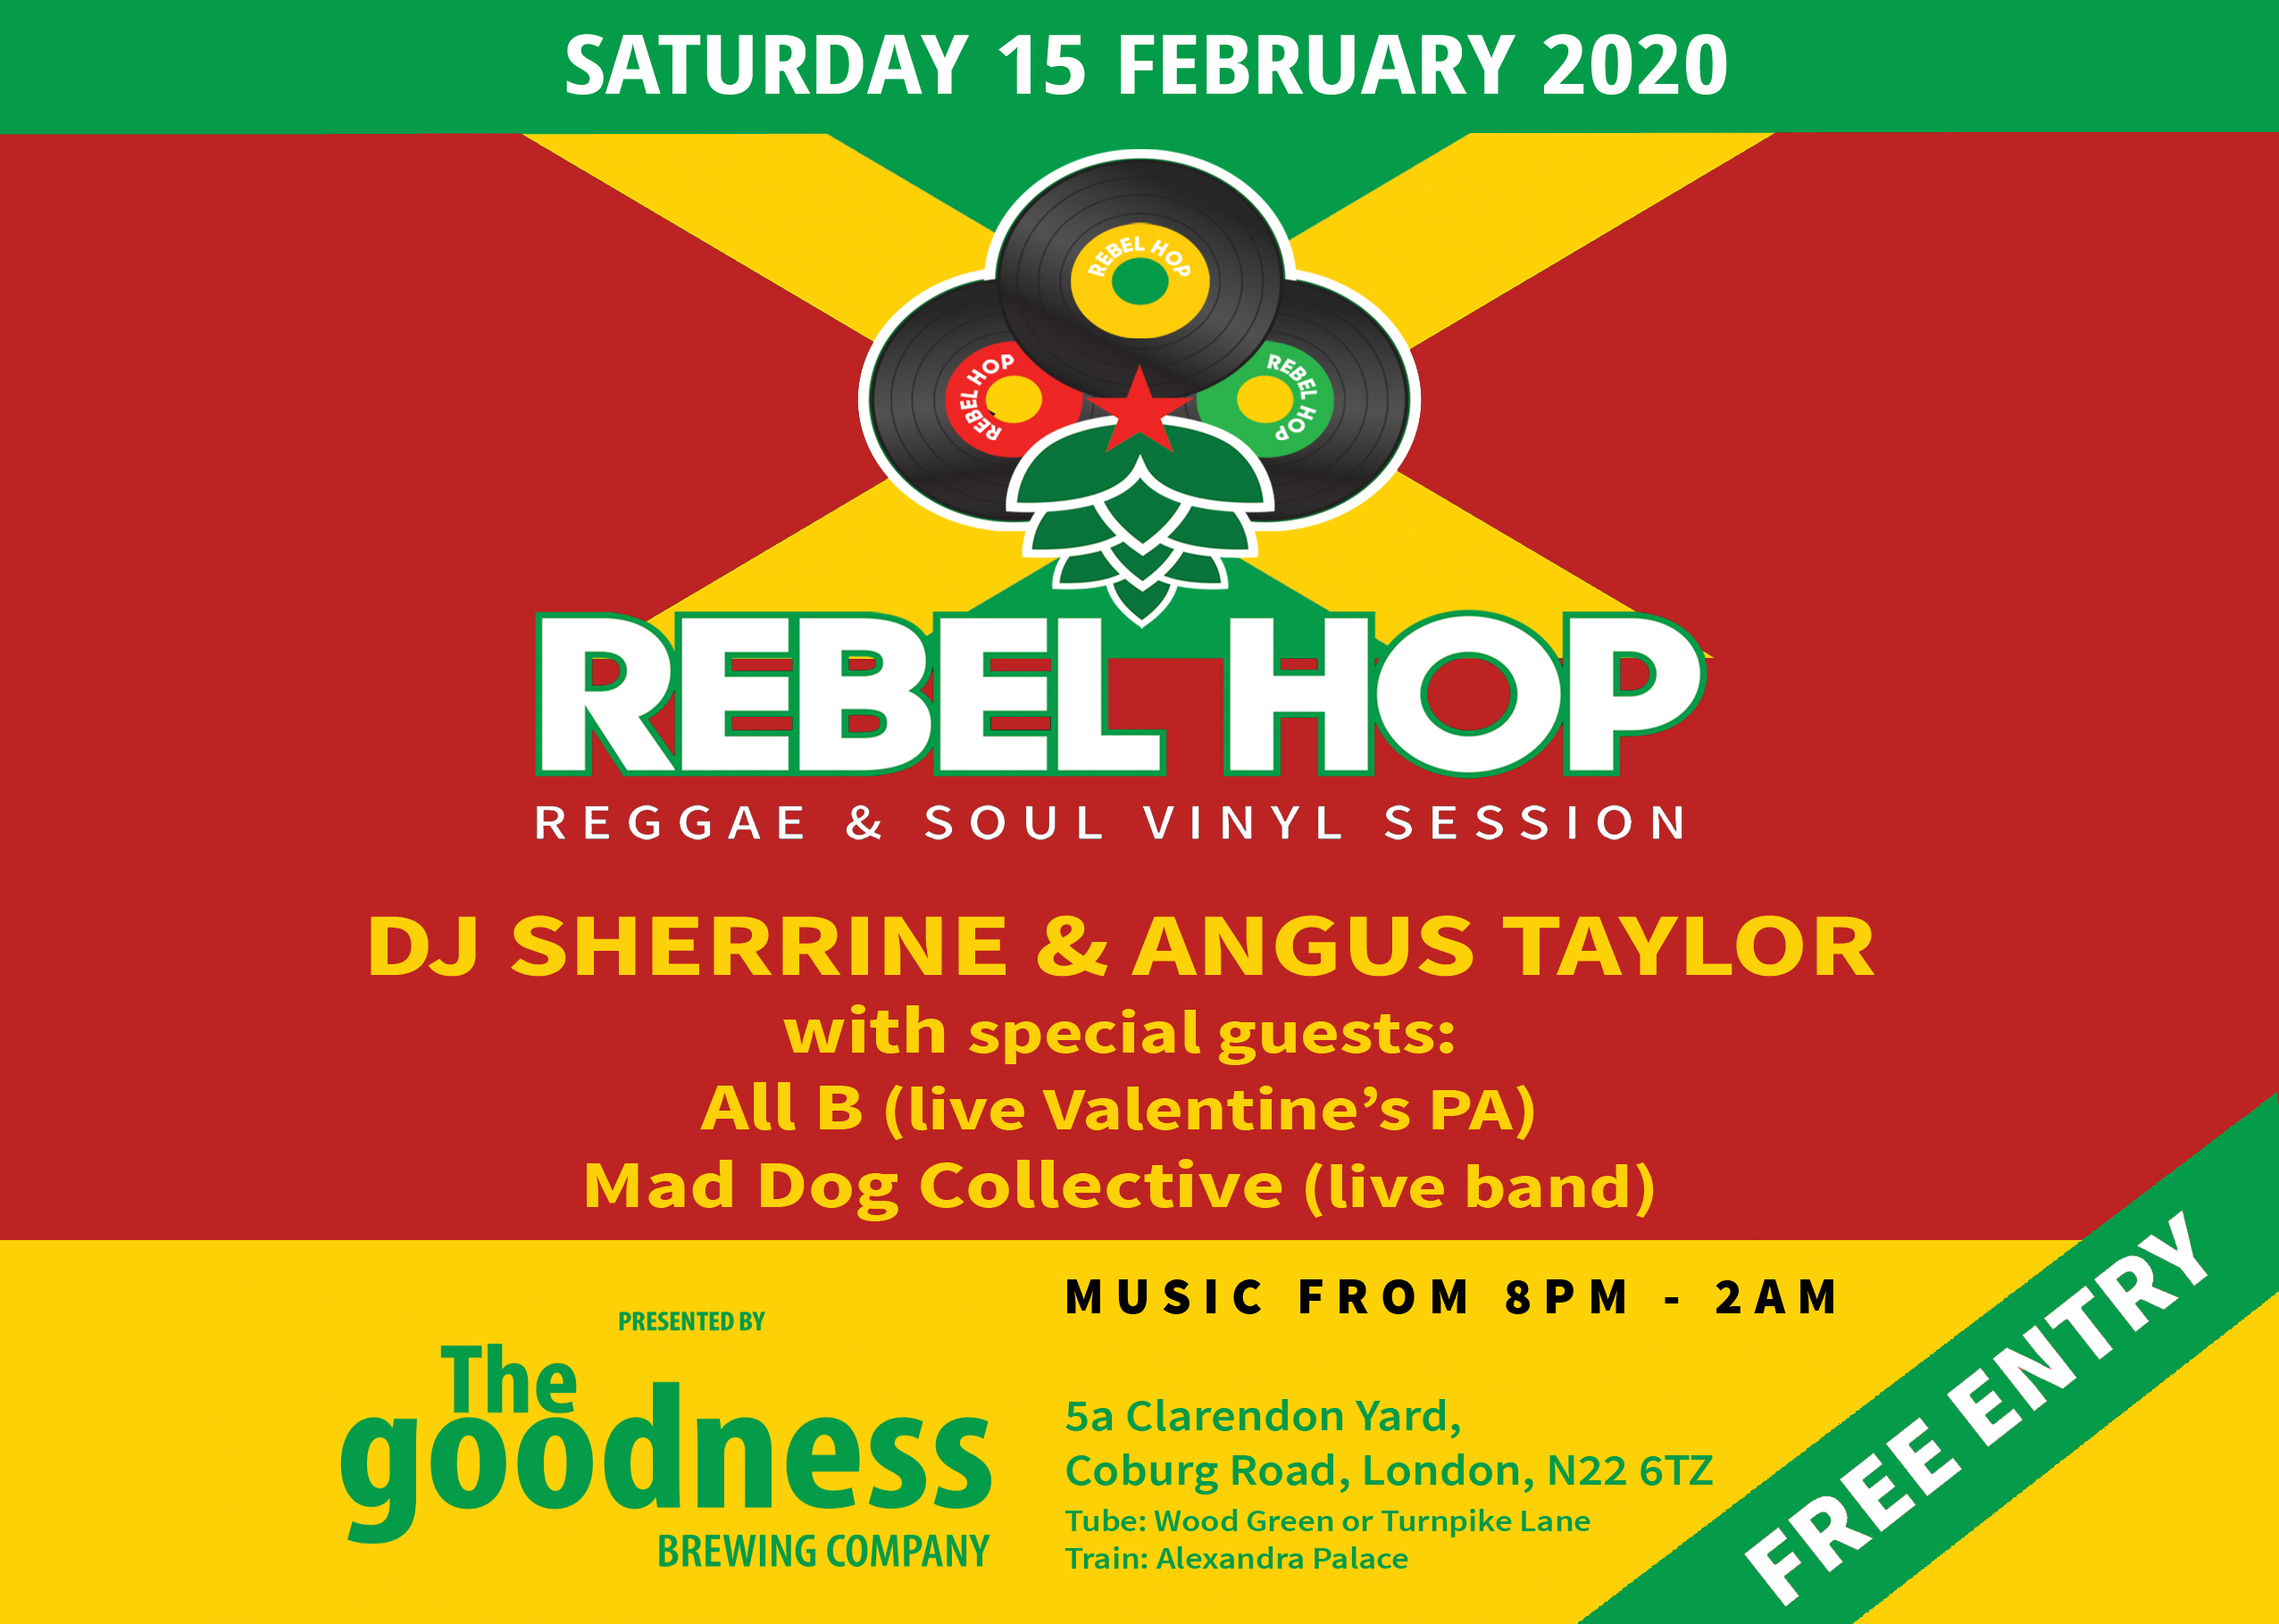 Rebel Hop 15 February 2020 landscape